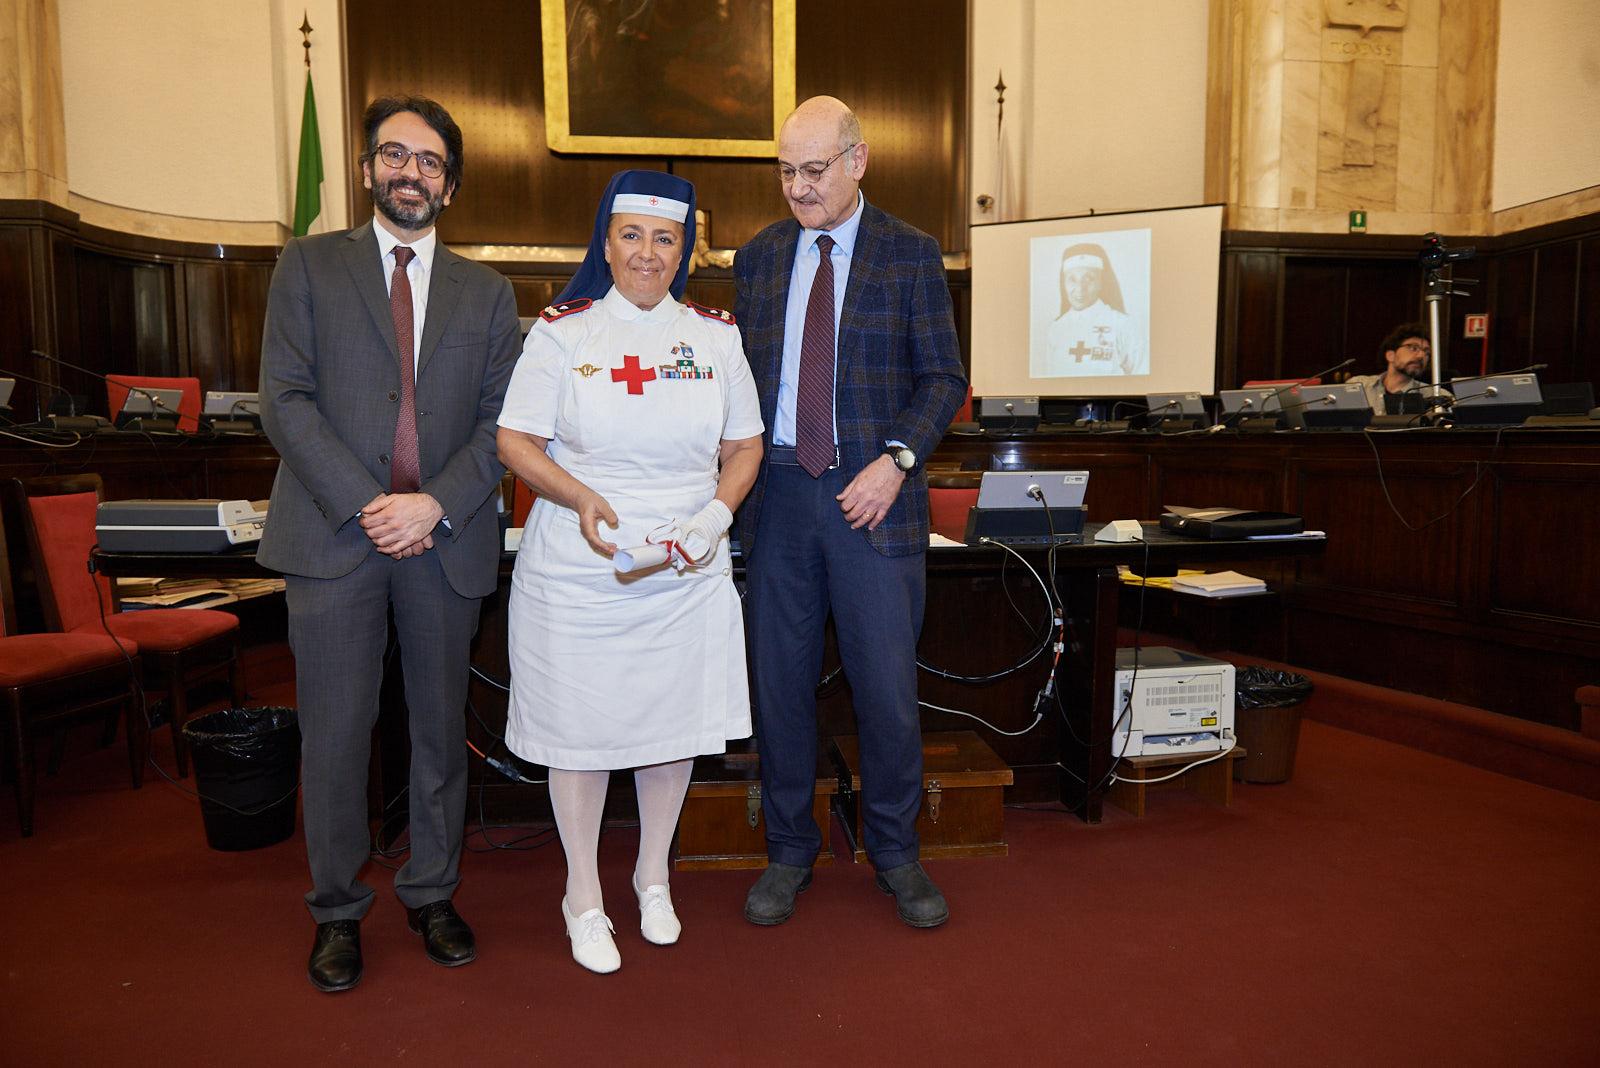 Sister Monica Dialuce Gambino picks up the parchment for Maria Vittoria Zeme